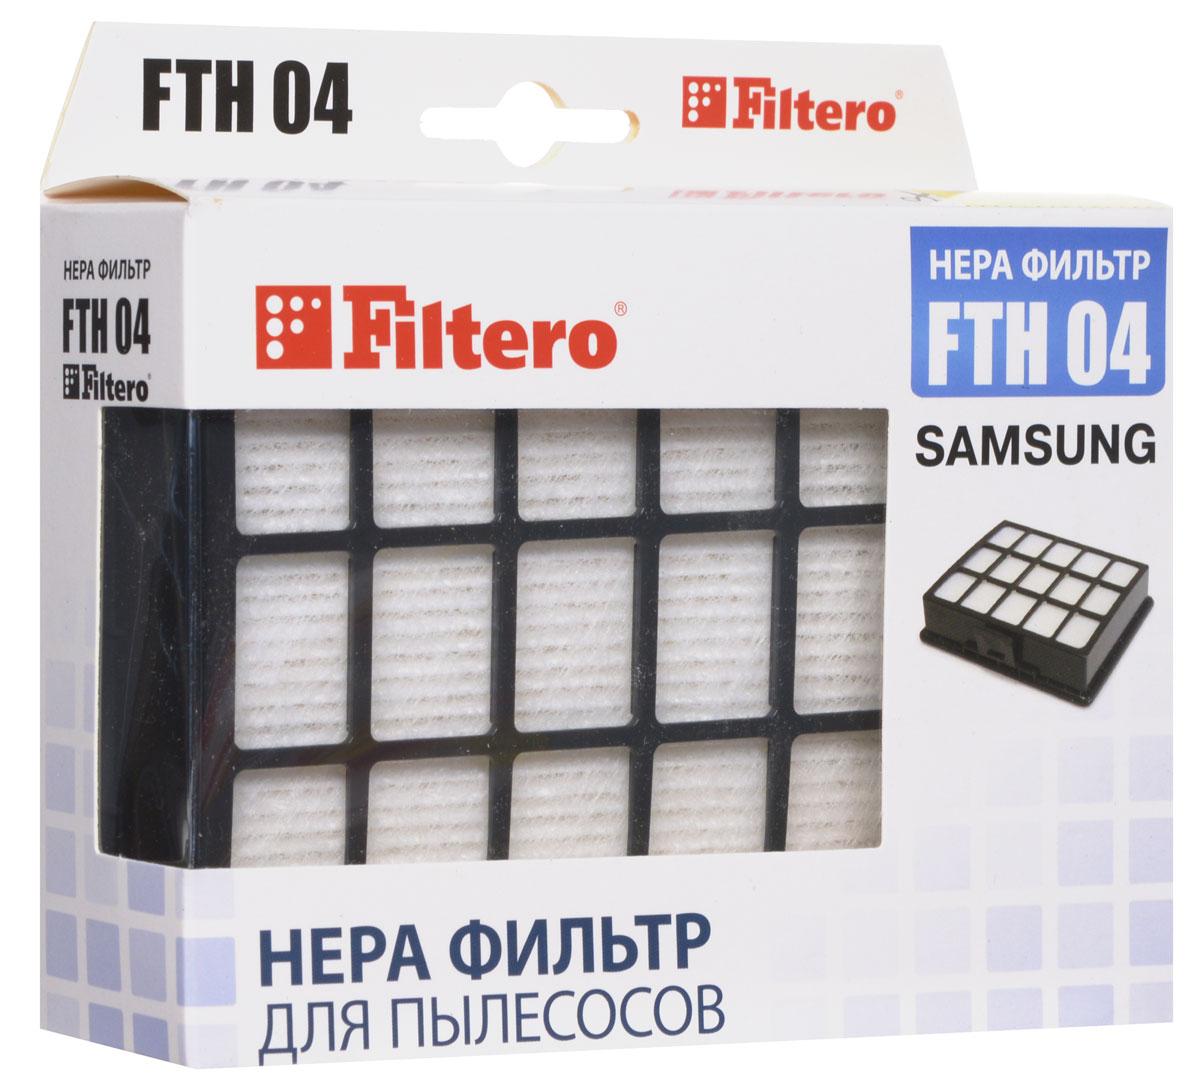 Filtero FTH 04 SAM Hepa-фильтр для Samsung фильтр filtero fth 07 sam hepa для пылес samsung